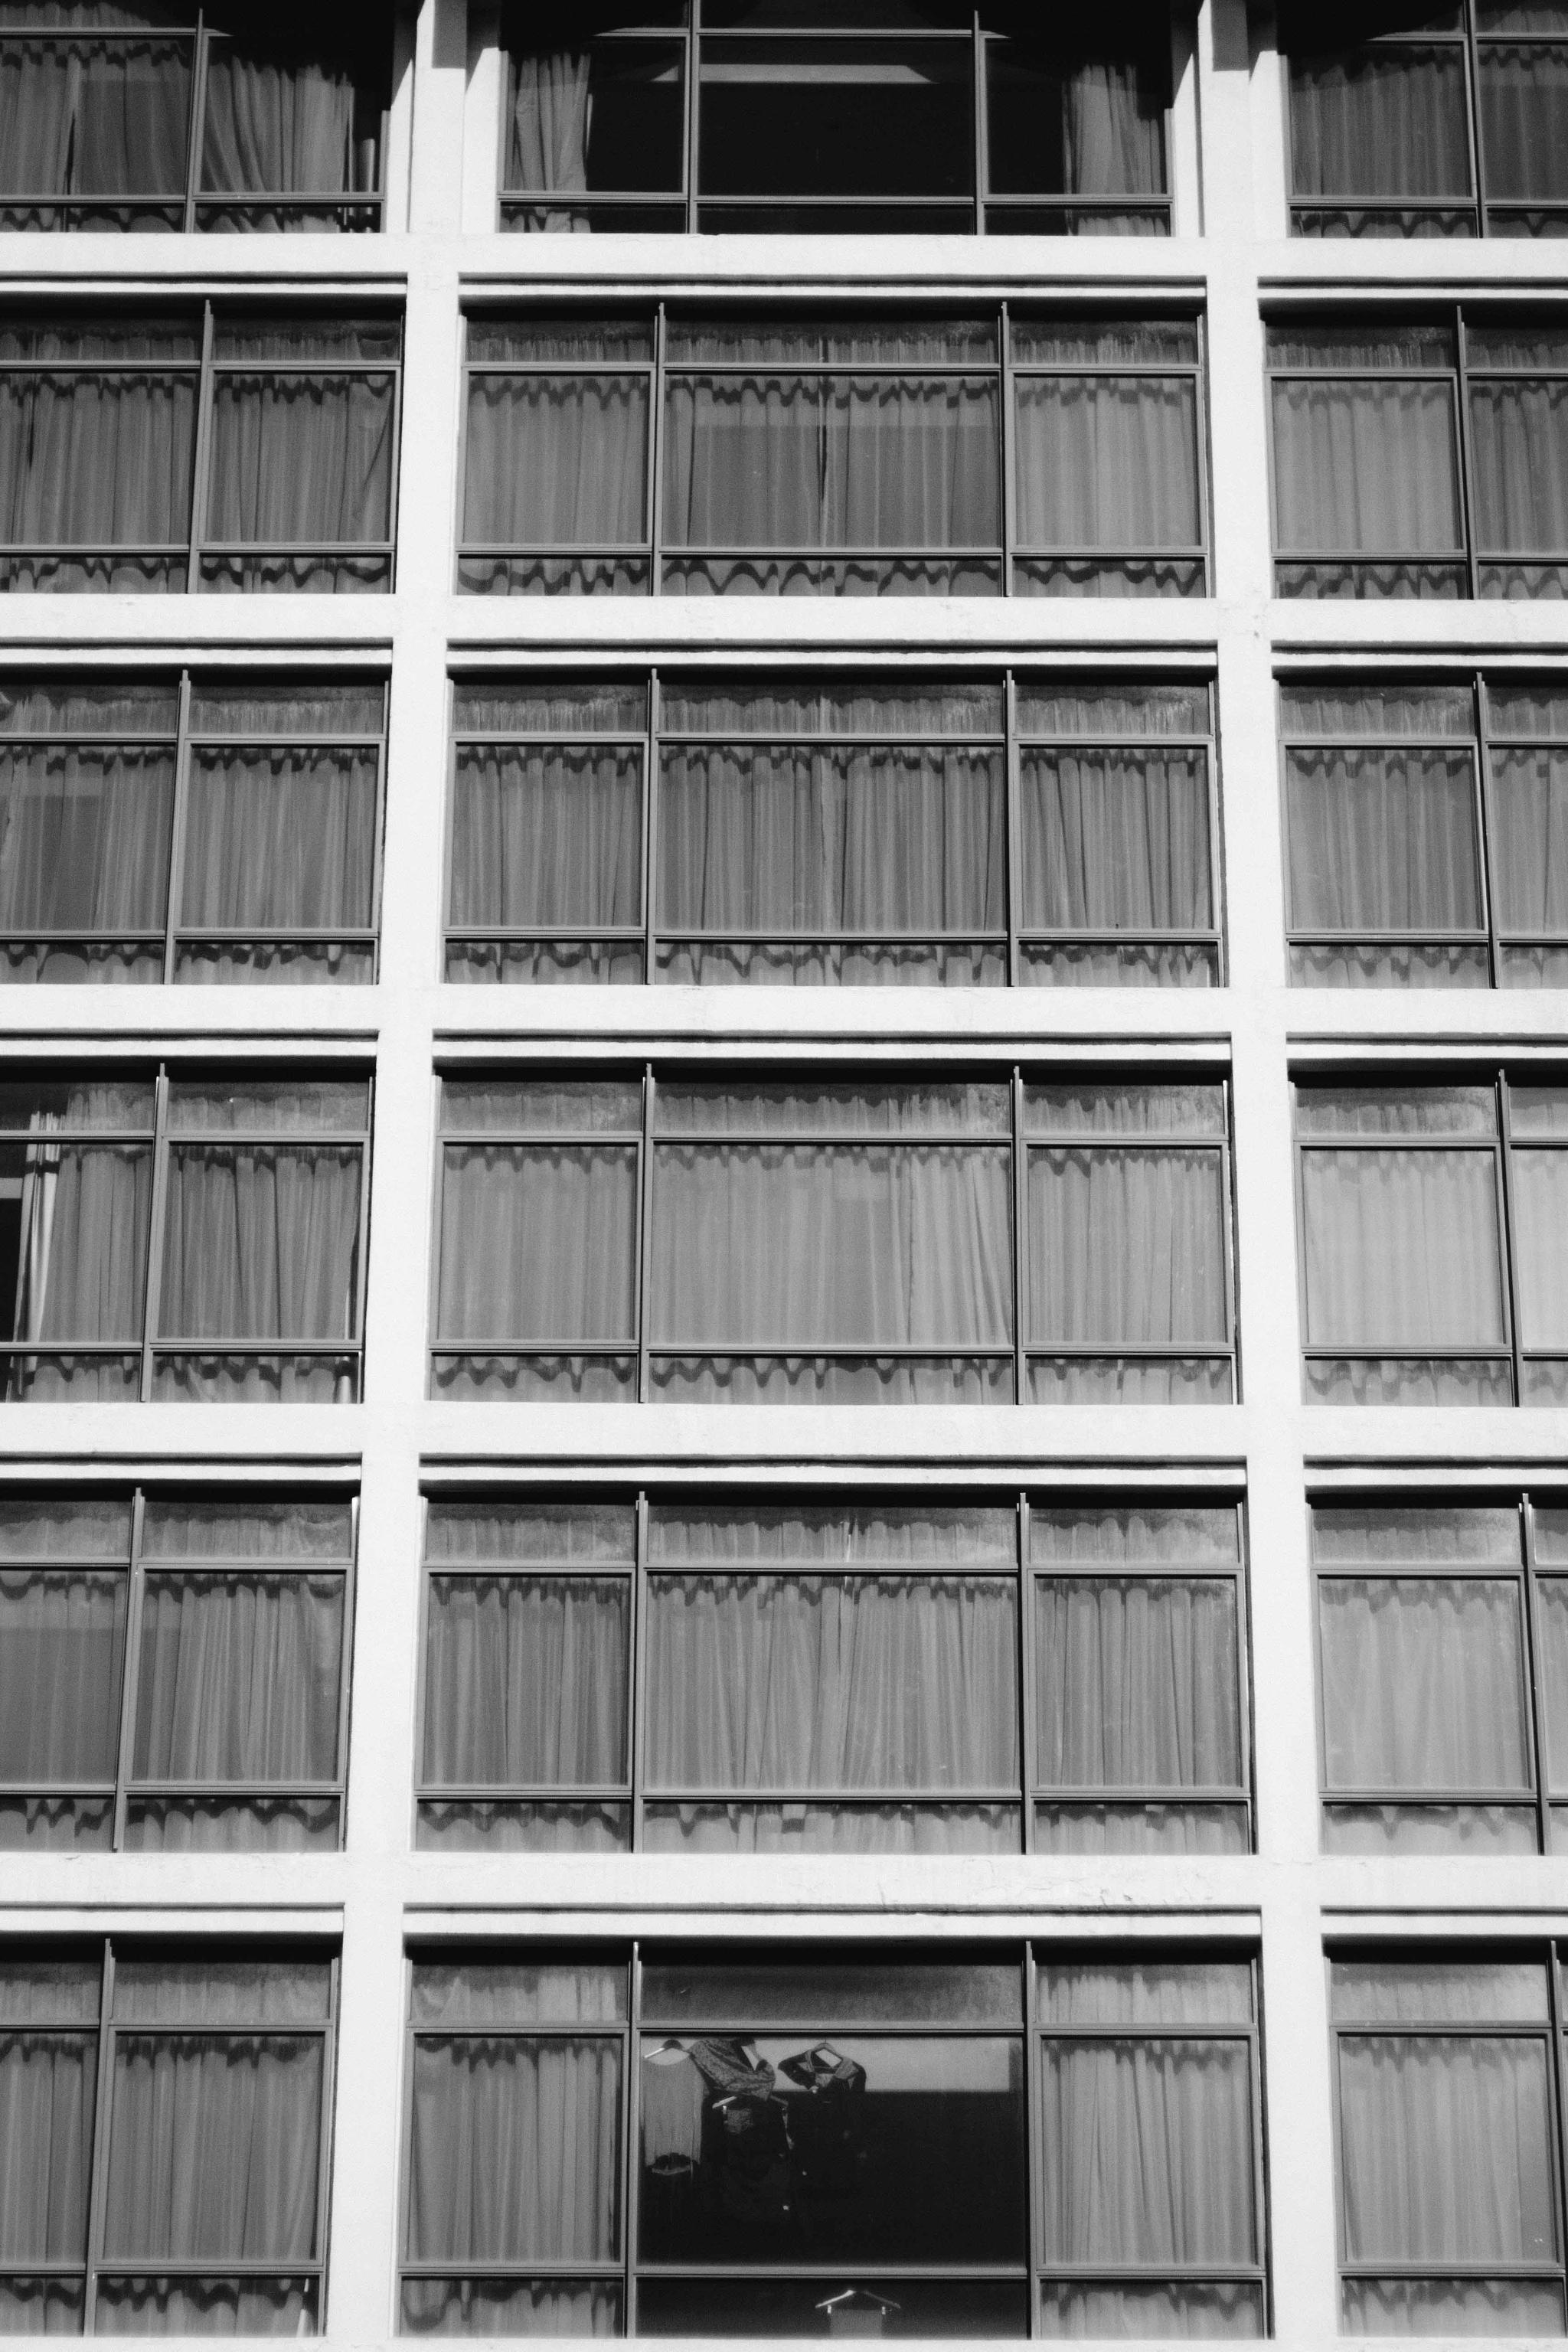 Window grille kota kinabalu - This Building Was Formerly Known As Kota Kinabalu International Sabah